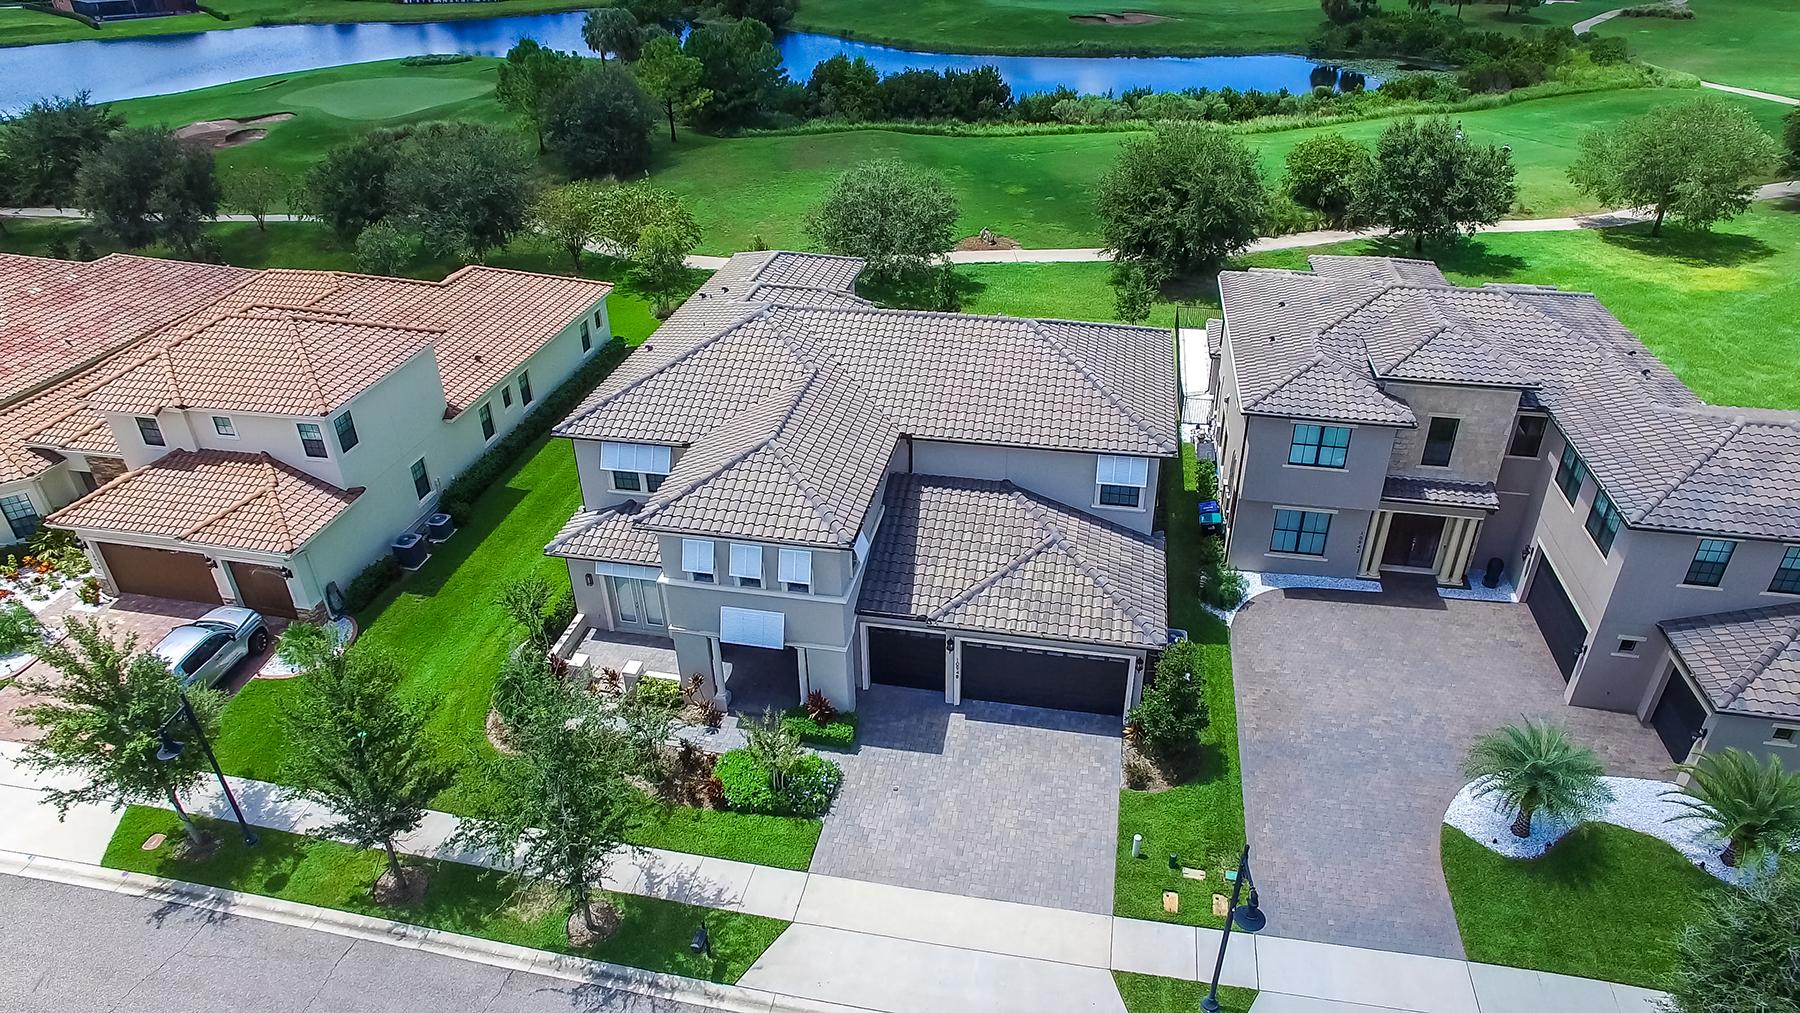 Single Family Home for Sale at LAKE NONA 10948 Mobberley Cir Orlando, Florida 32832 United States